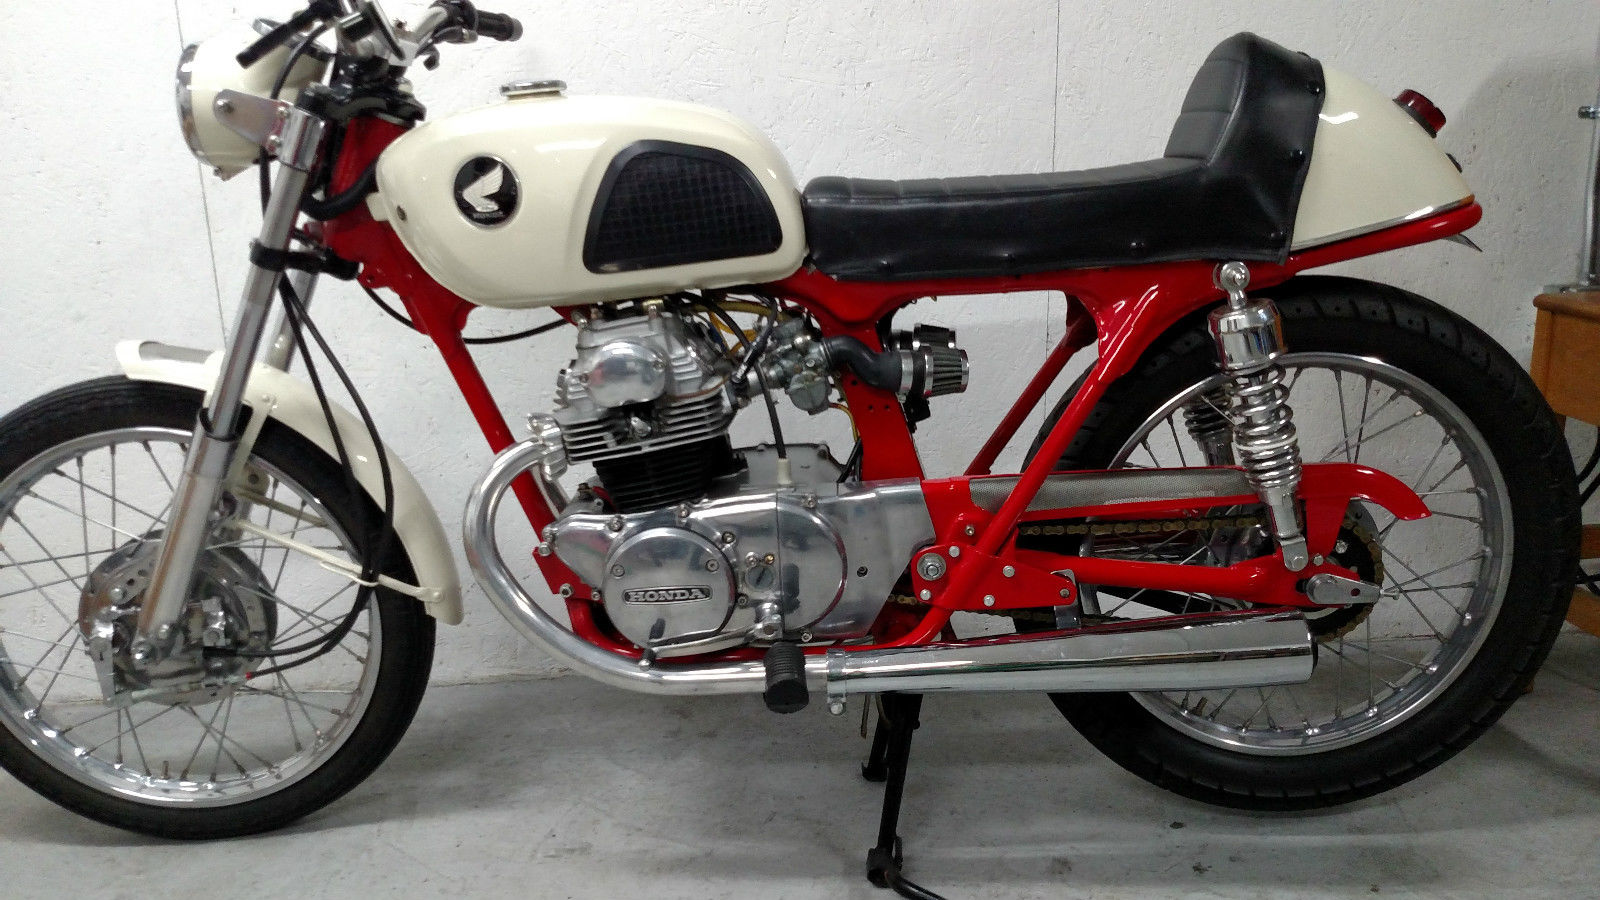 Honda CB175 Cafe Racer 370 Miles Since Restoration